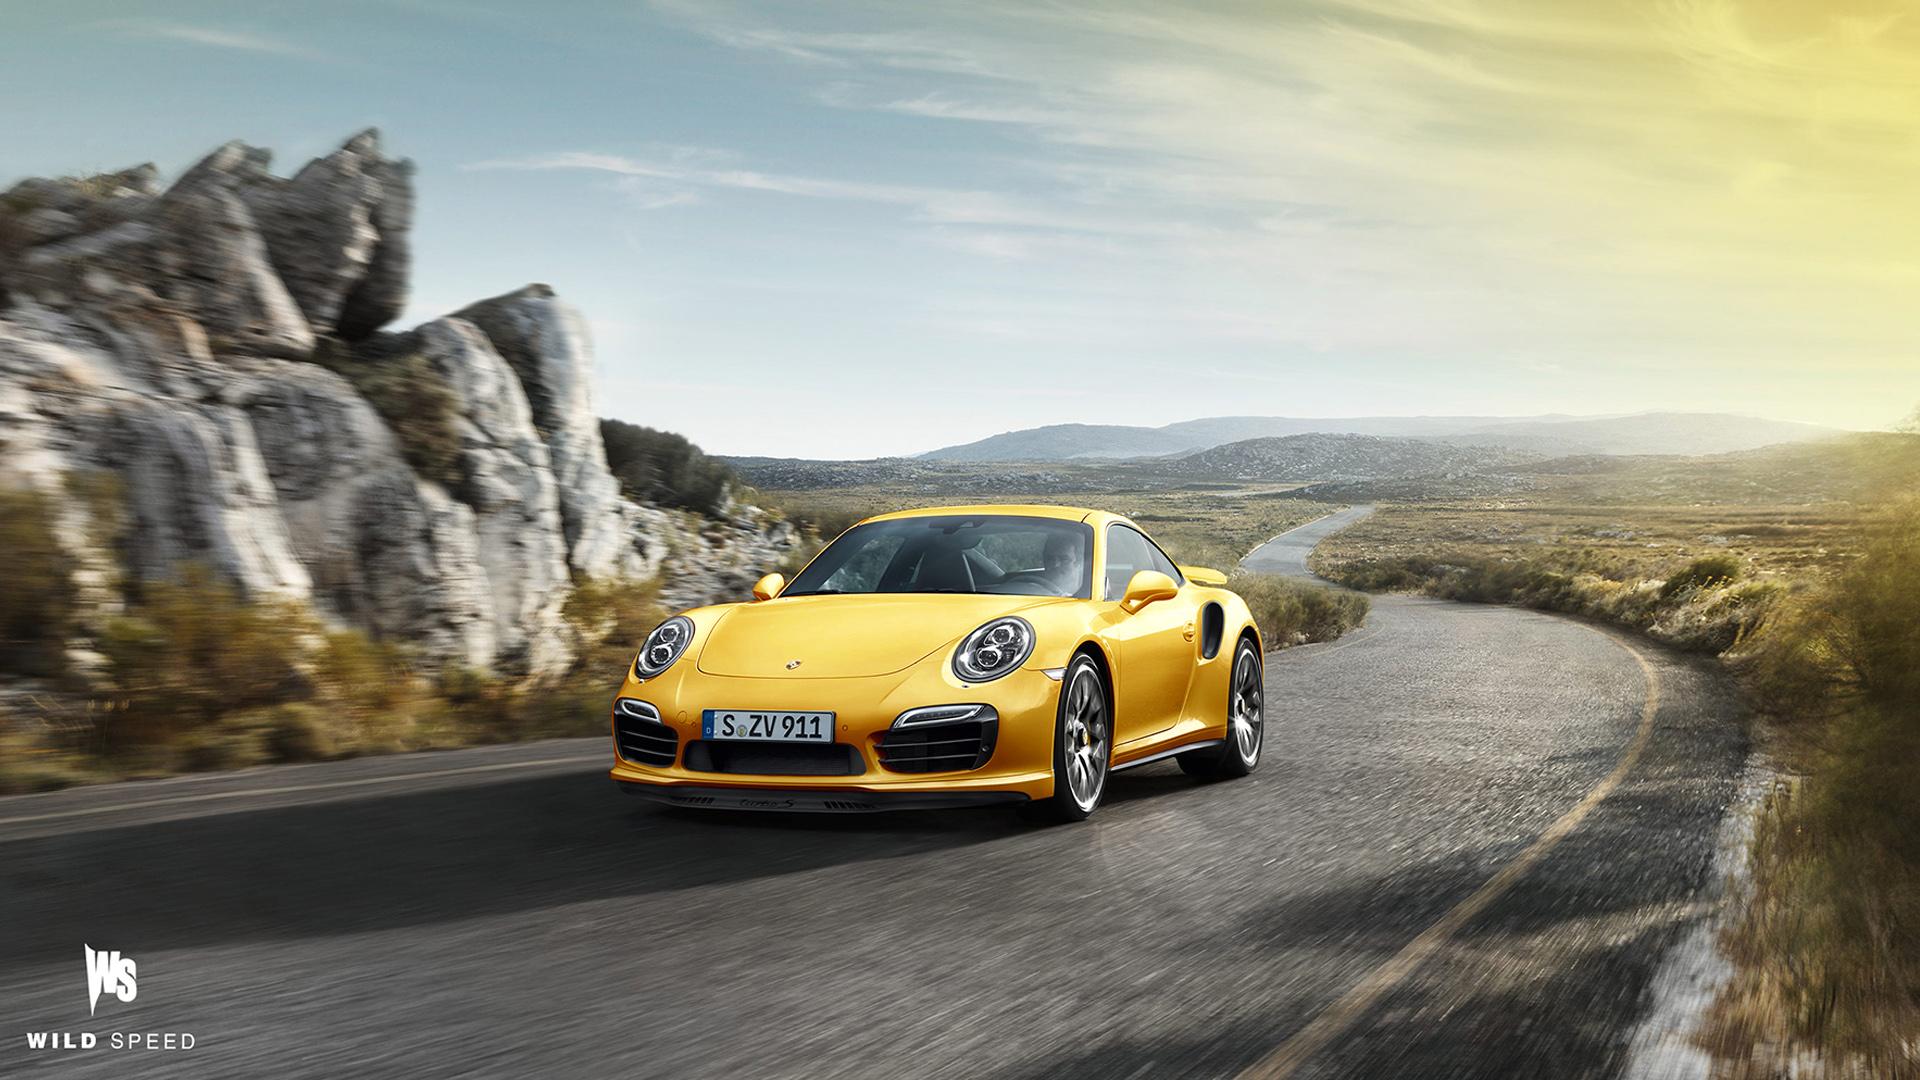 Yellow Porsche 911 Turbo S Wallpaper Hd Car Wallpapers Id 3476